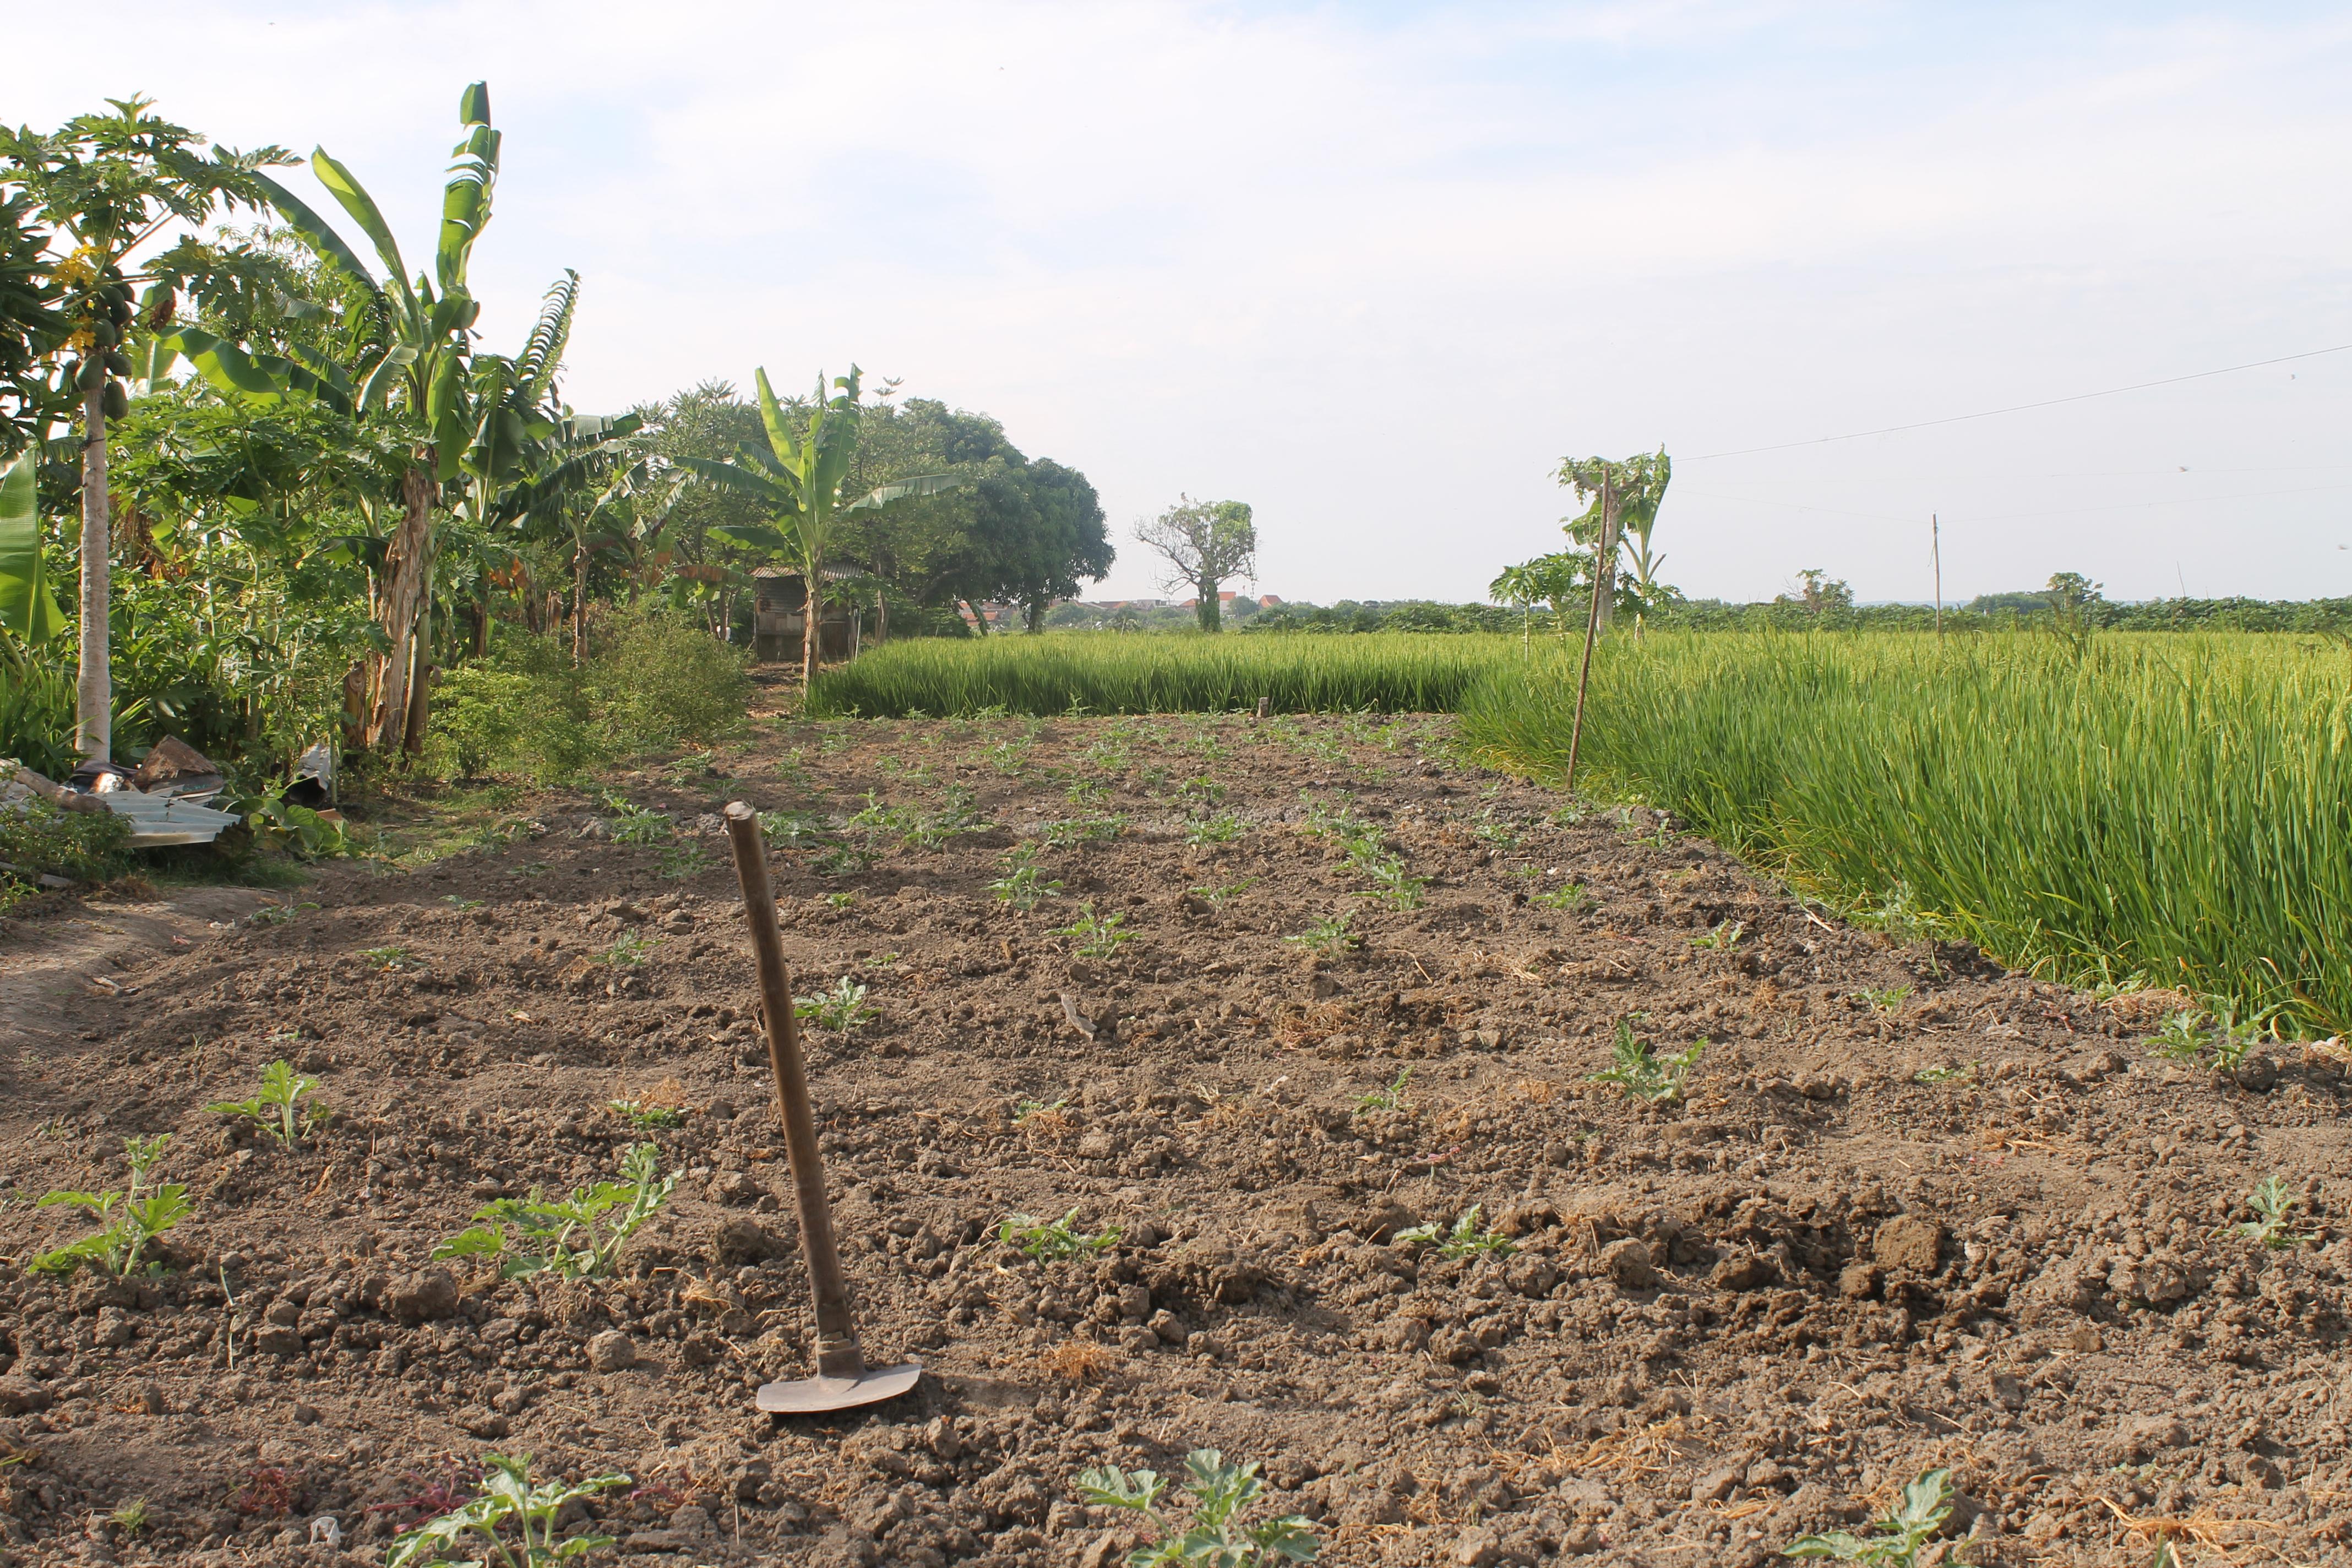 Pertanian Dataran Rendah Justmaulz